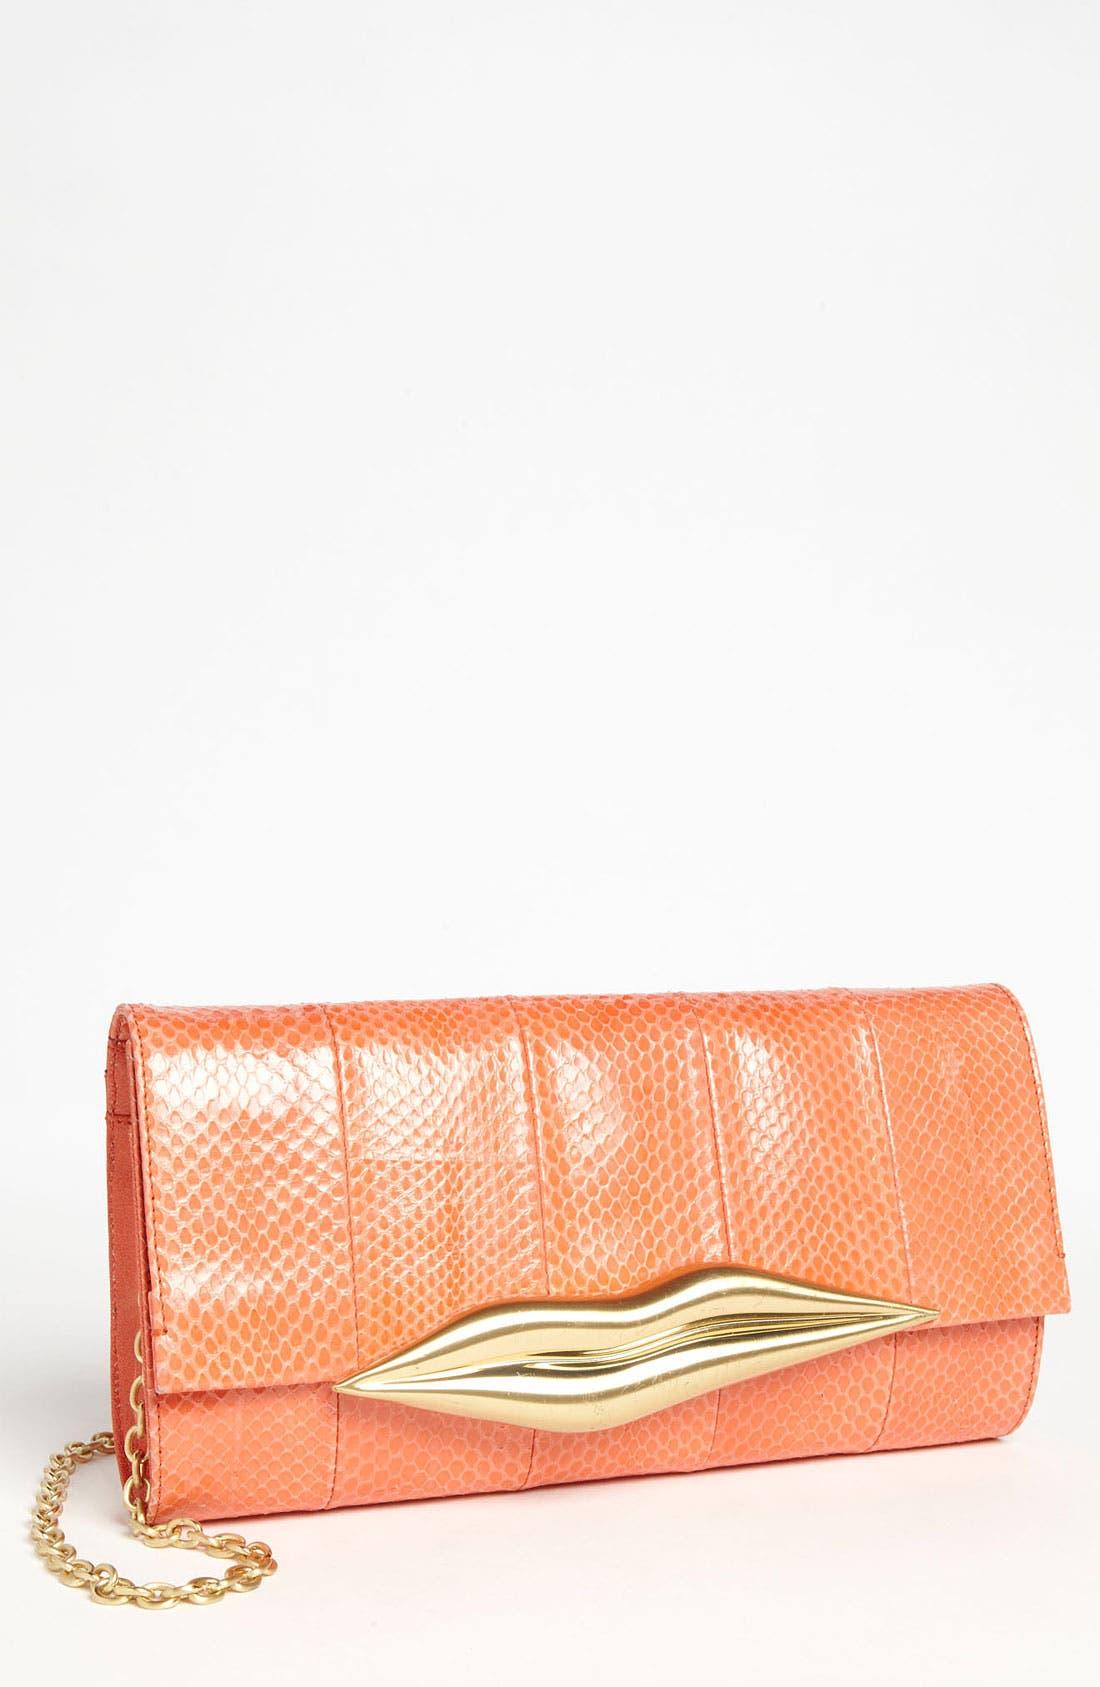 Alternate Image 1 Selected - Diane von Furstenberg 'Carolina Lips' Leather & Genuine Snakeskin Clutch